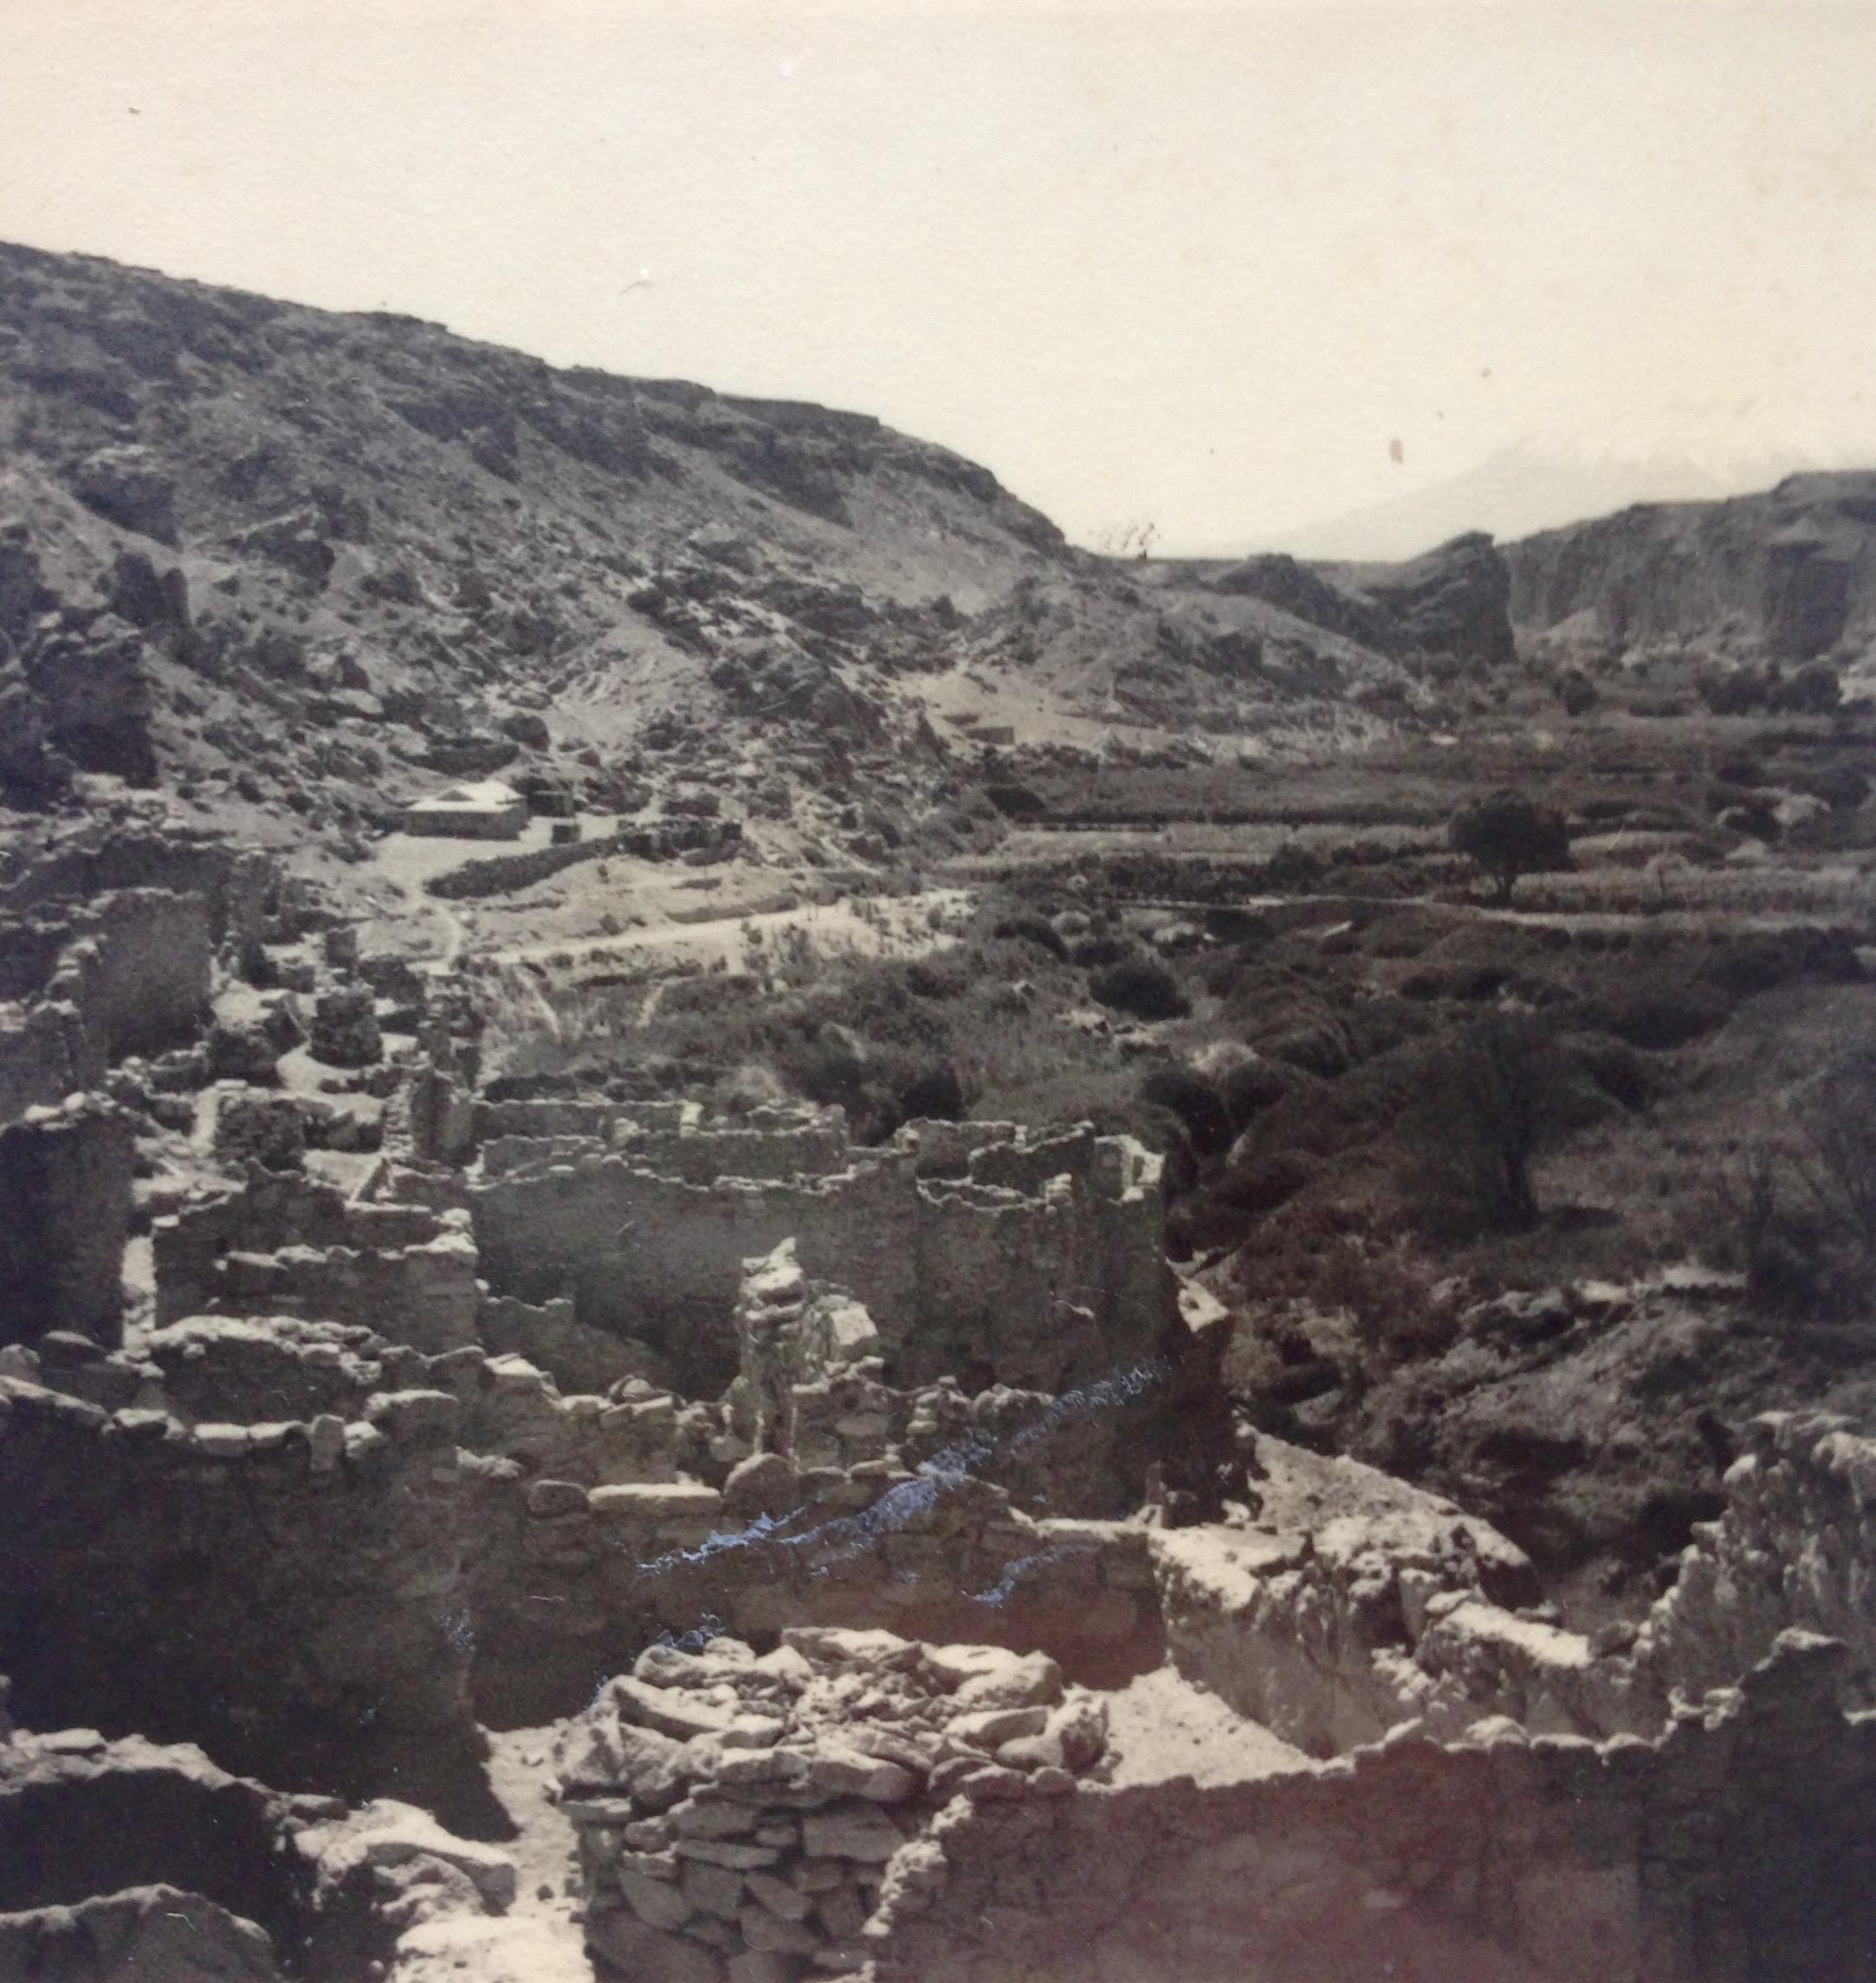 Enterreno - Fotos históricas de chile - fotos antiguas de Chile - Pucará de Chiu Chiu, 1965